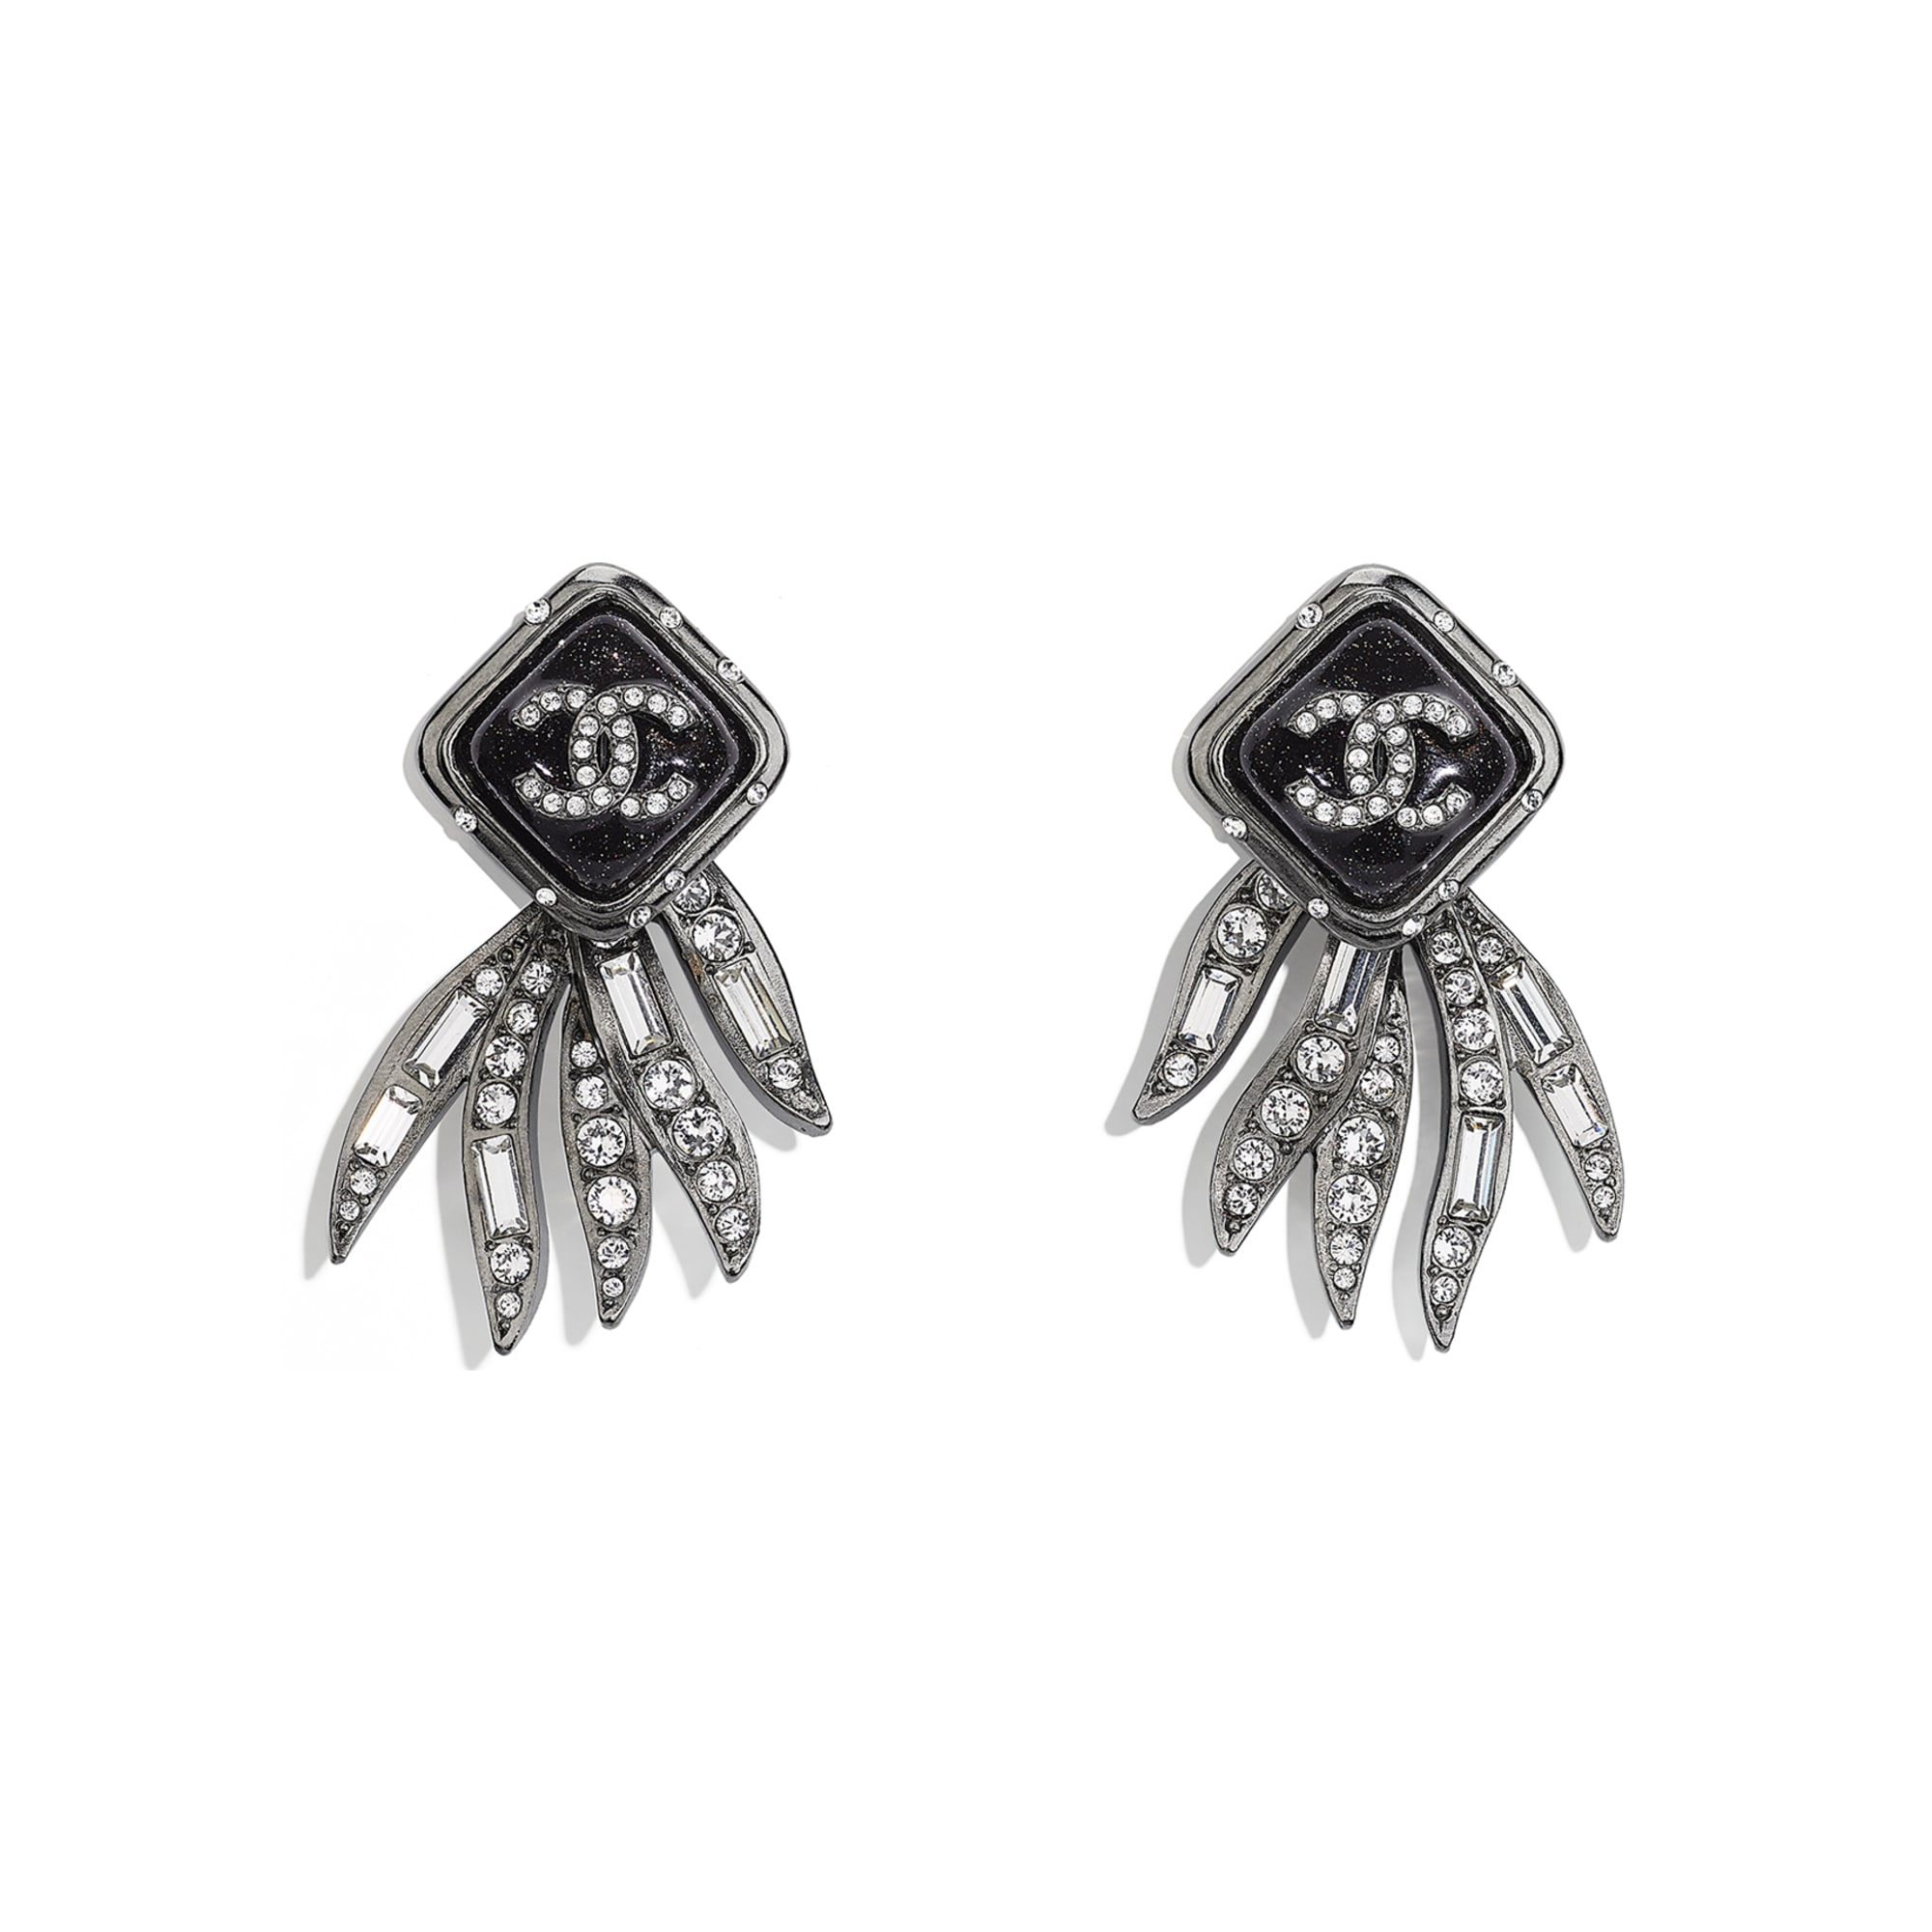 Earrings - Ruthenium, Black & Crystal - Metal & Diamantés - CHANEL - Default view - see standard sized version